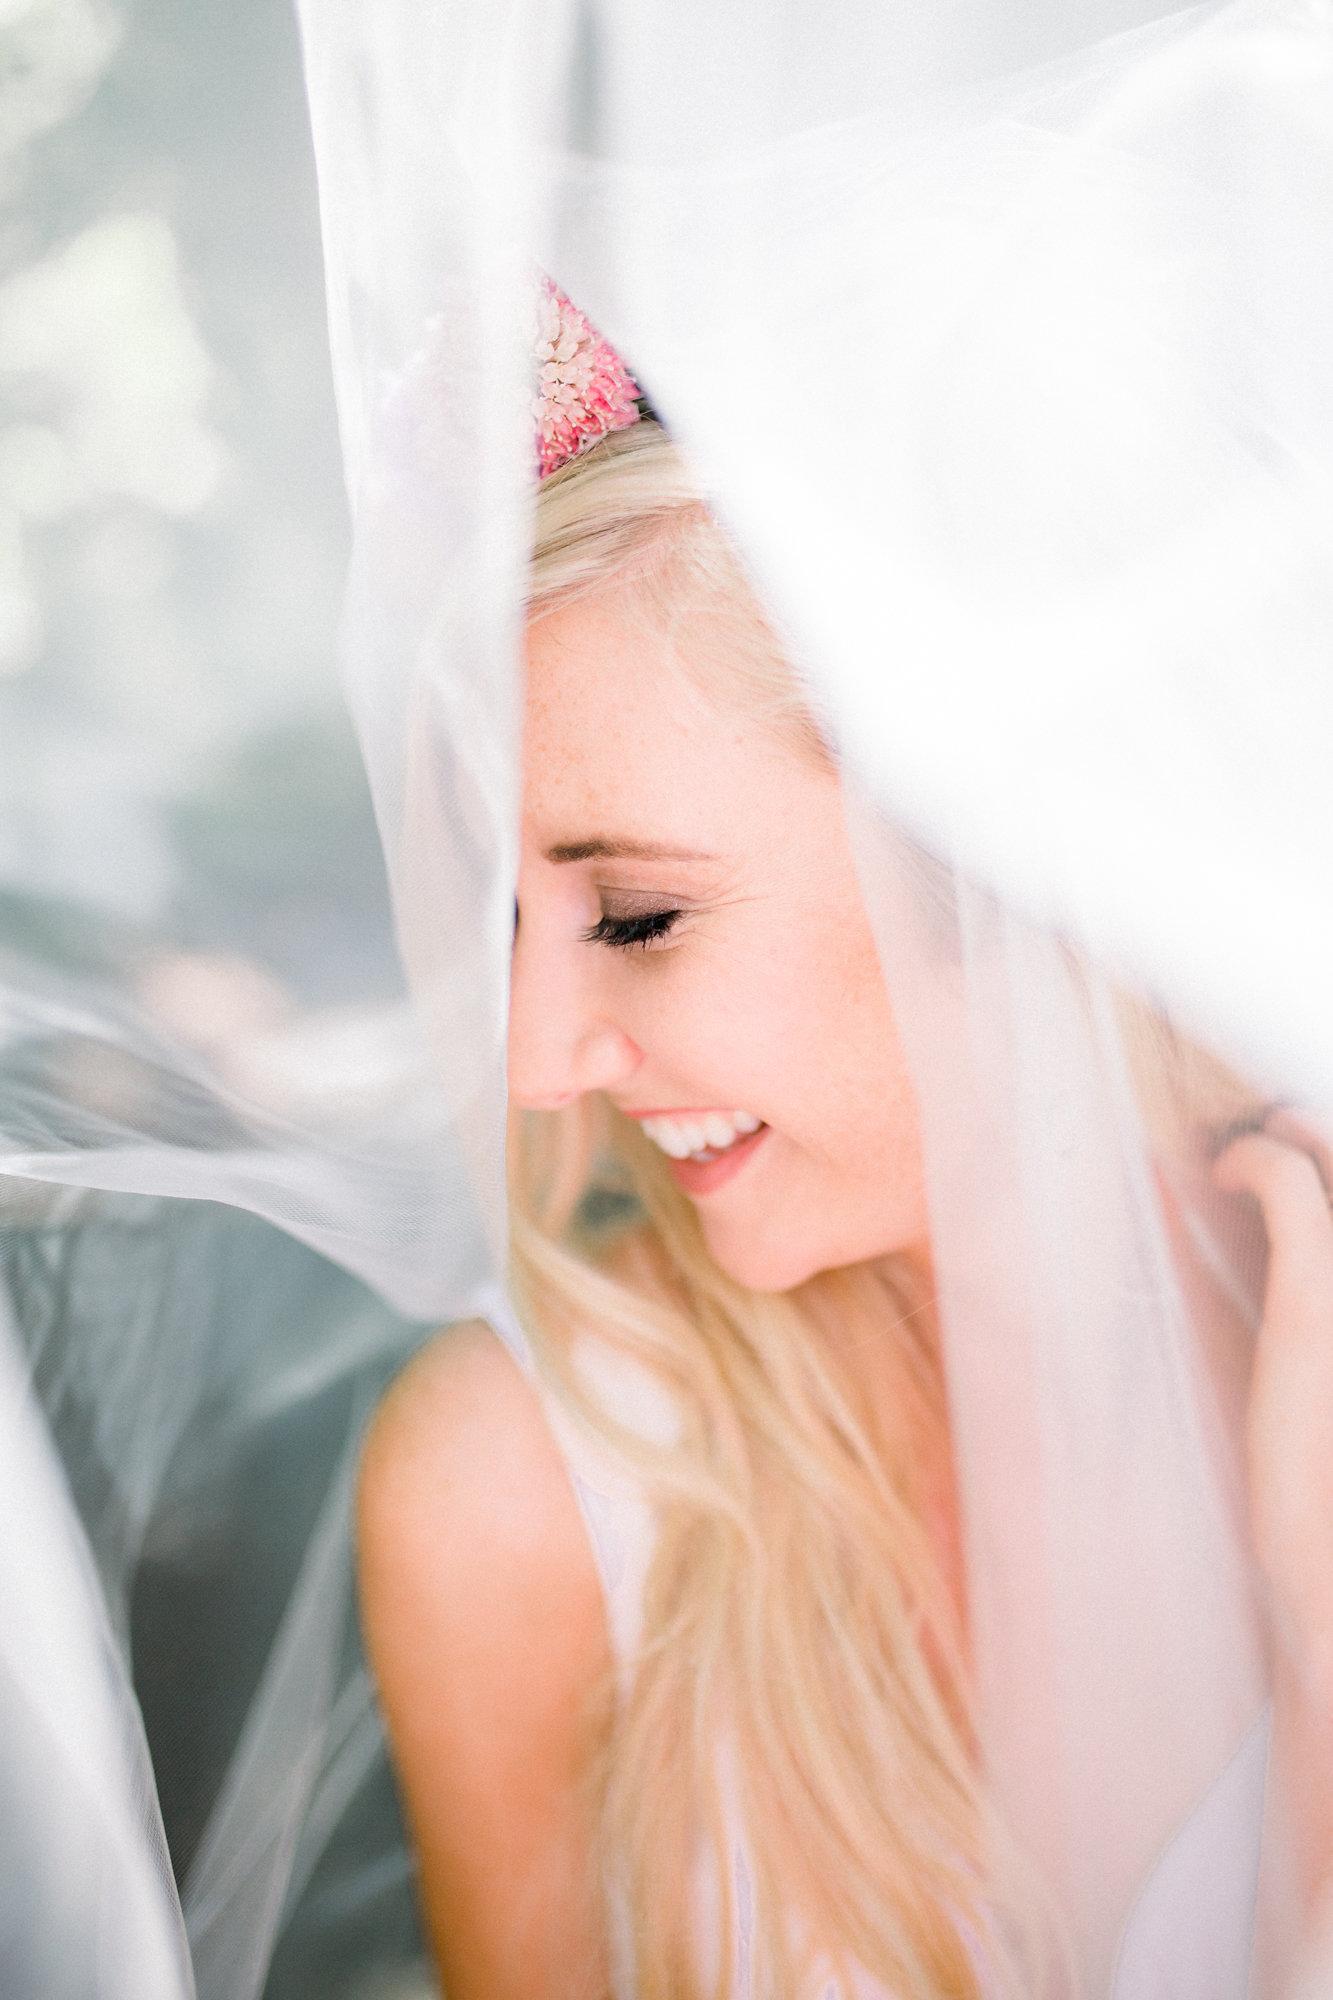 kim baker beauty luxury lifestyle and bridal makeup artist san jose bay area california onsite traveling camp harmon wedding style photoshoot amber dejoy photography bride veil